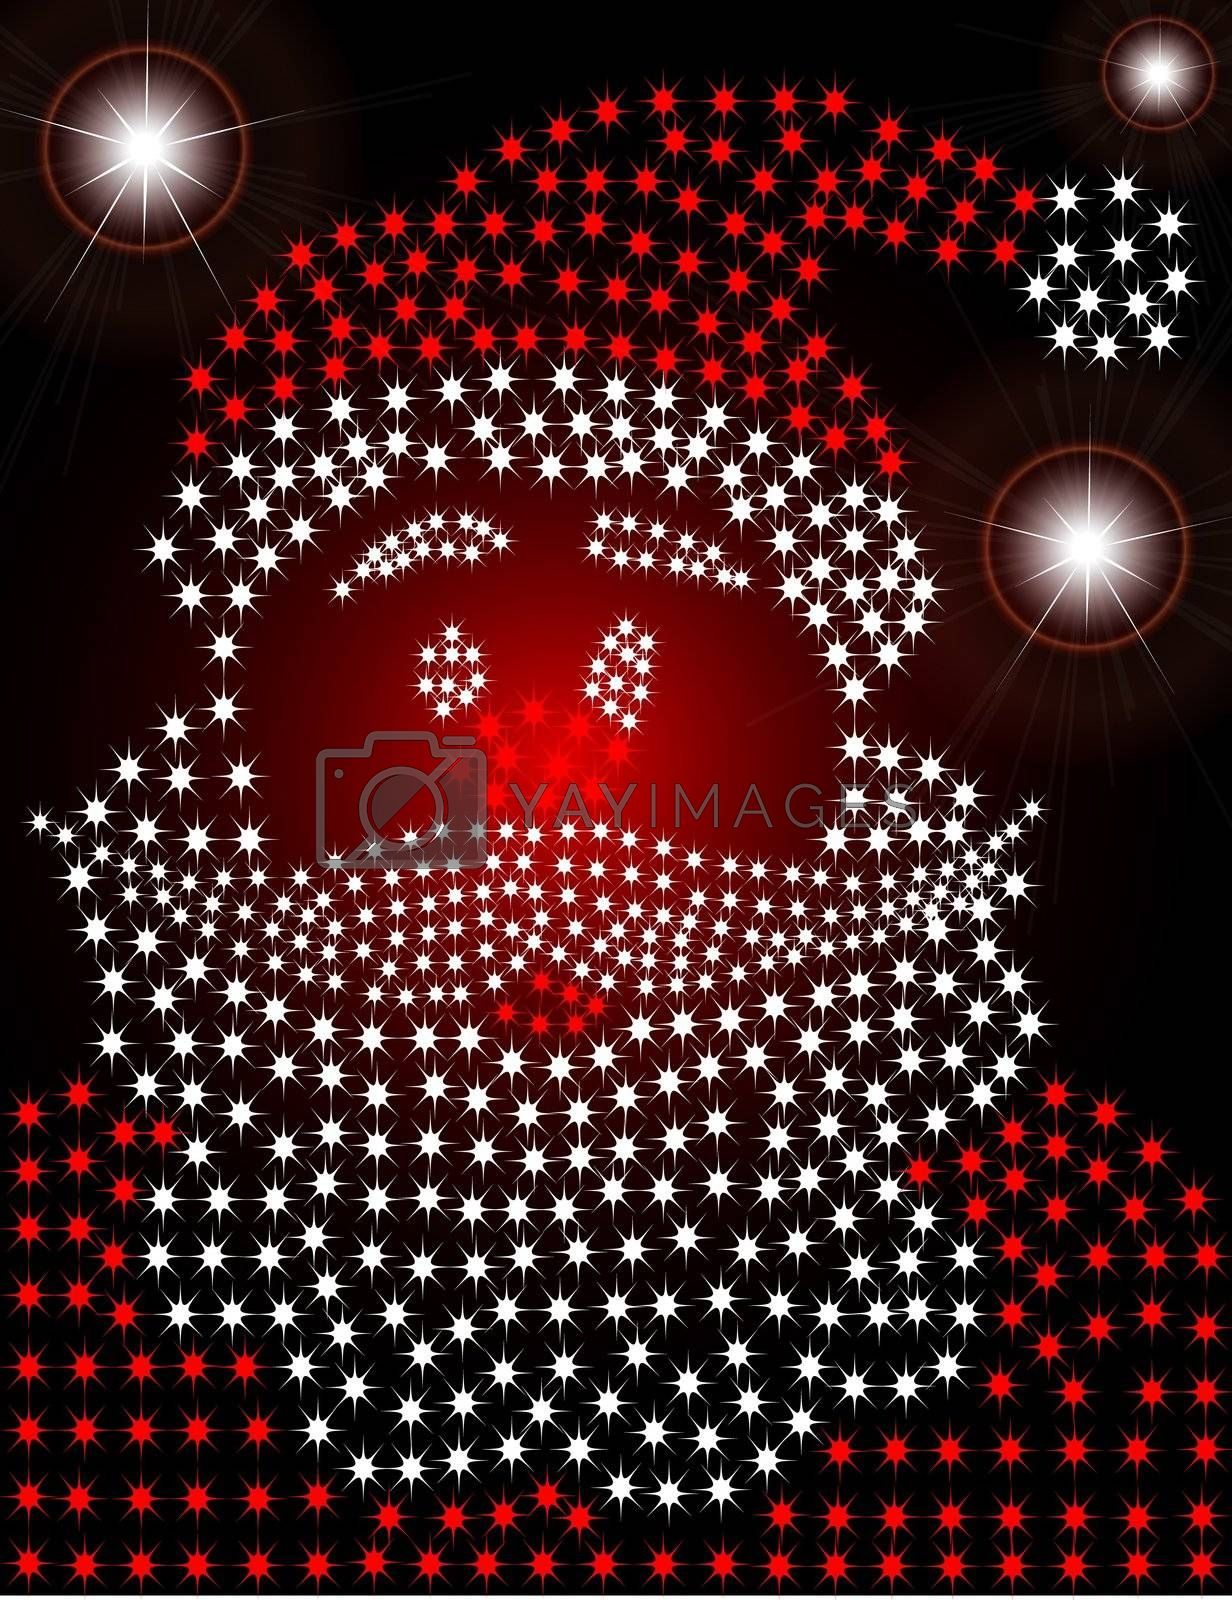 Royalty free image of Santa Claus by meletver